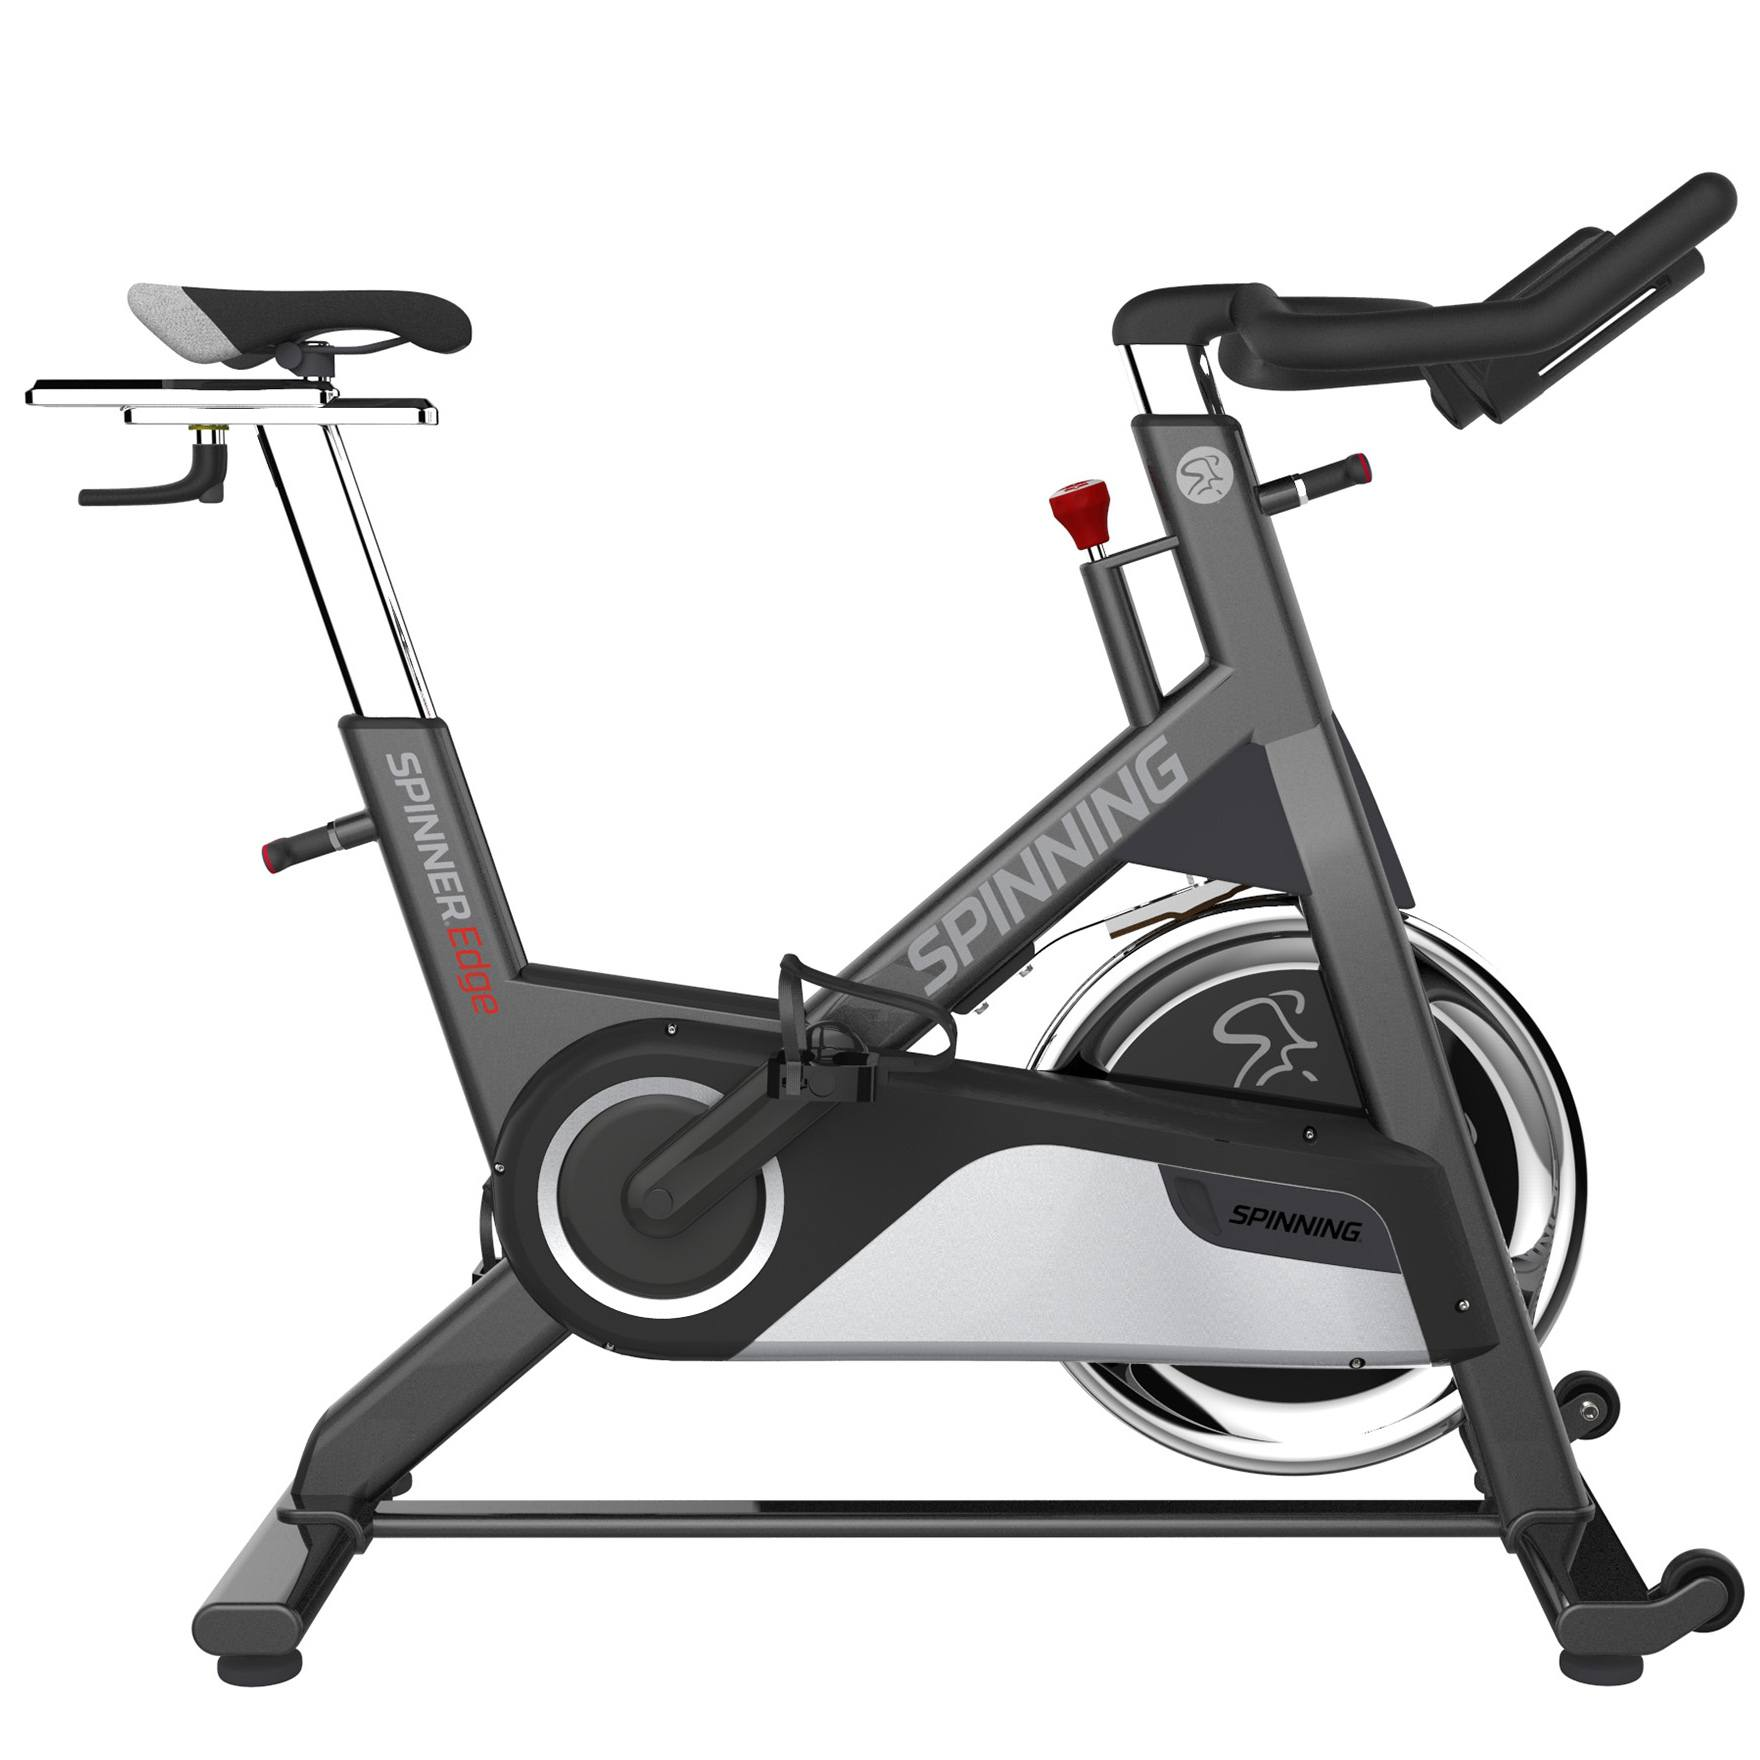 spinning bike spinner edge mit 4 dvd s g nstig kaufen. Black Bedroom Furniture Sets. Home Design Ideas